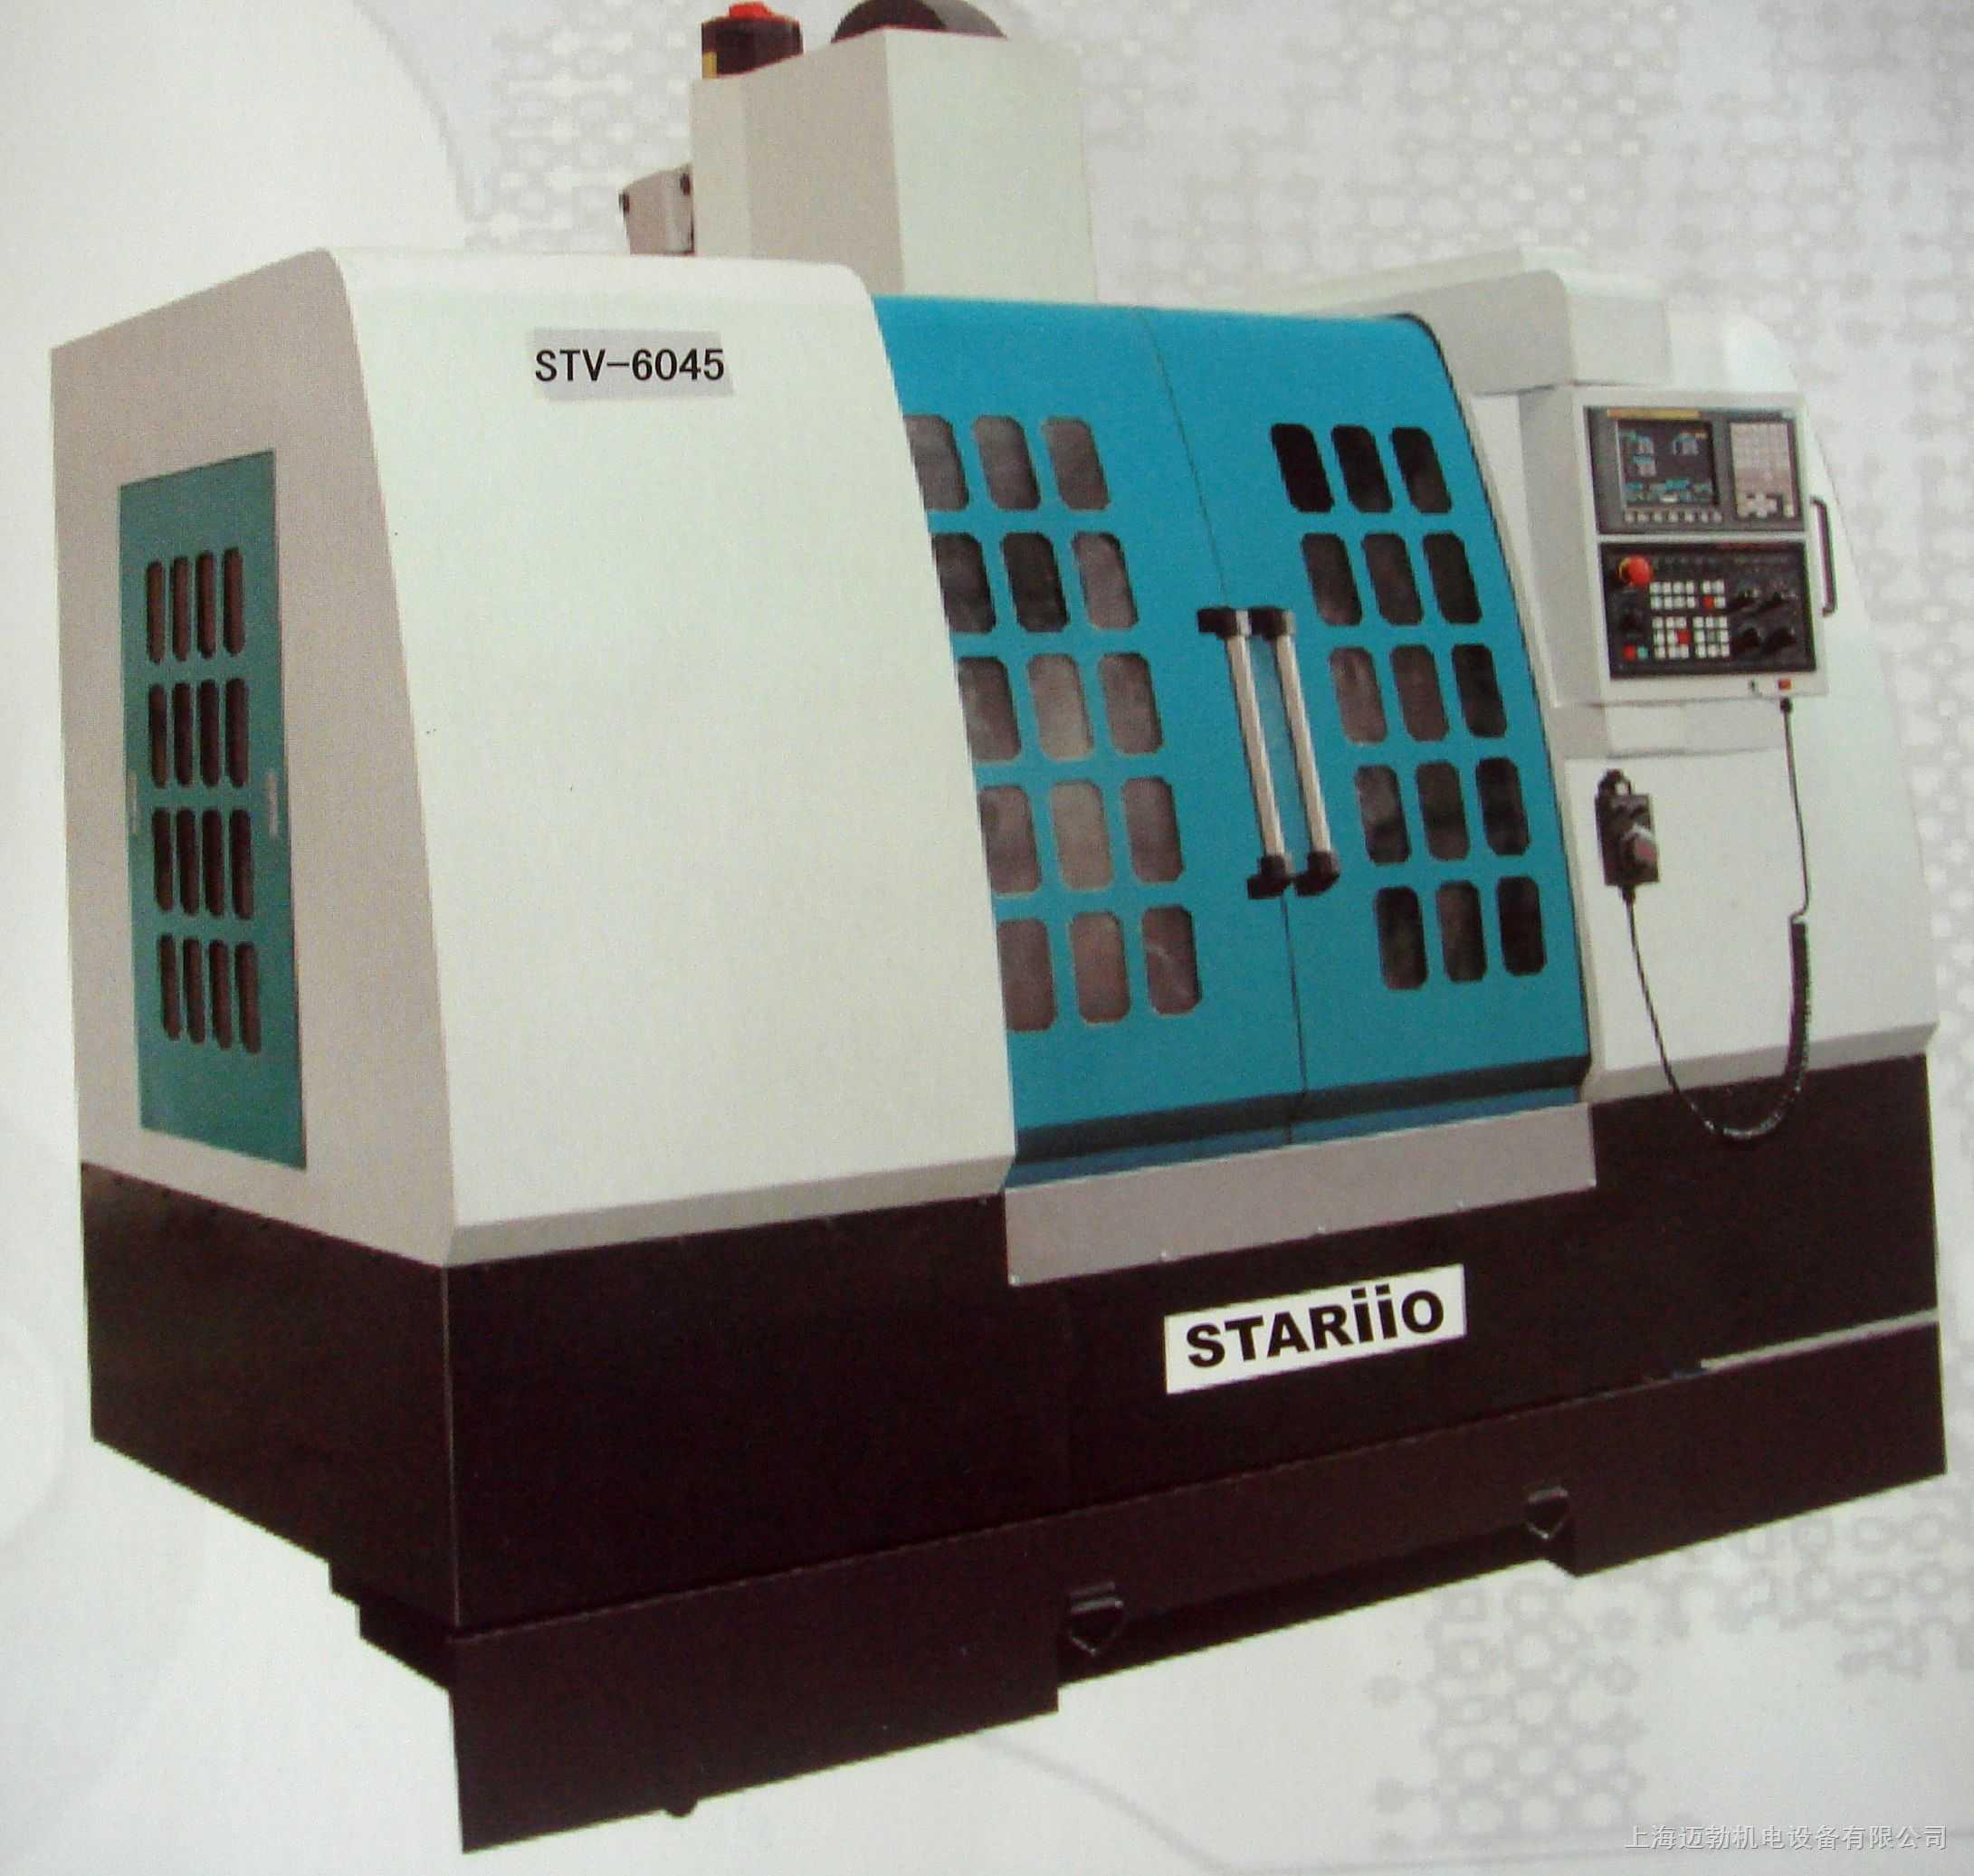 STV-6045